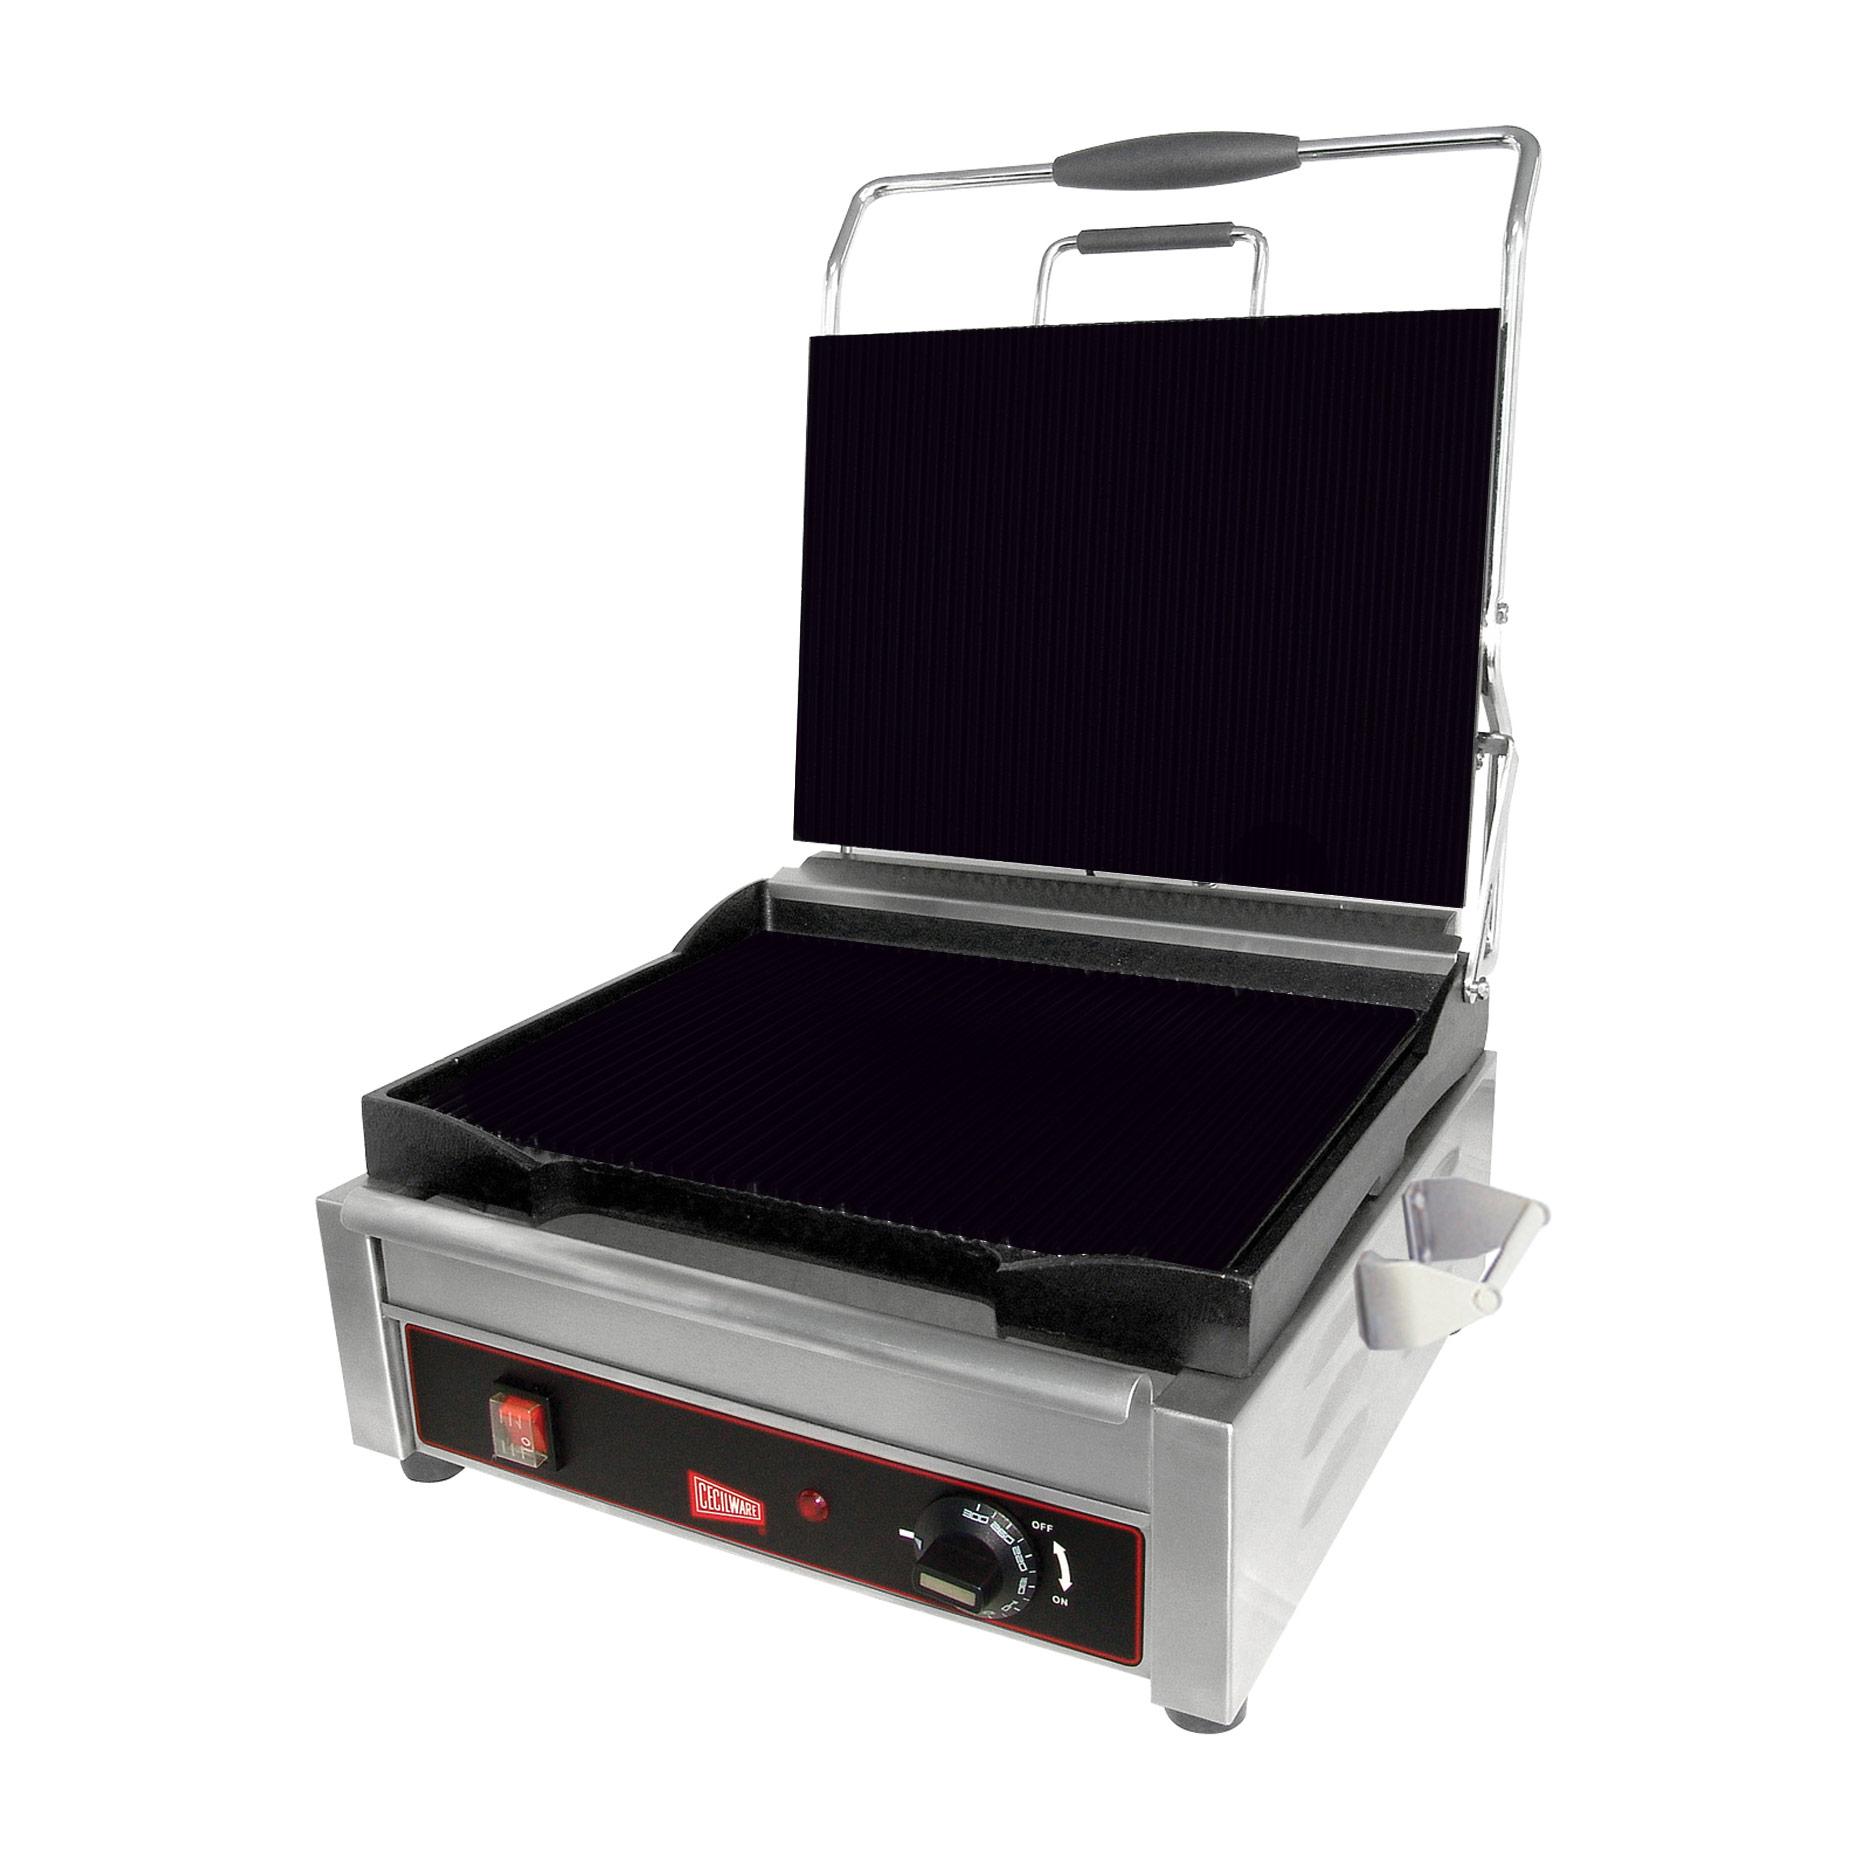 Grindmaster-Cecilware SG1LF sandwich / panini grill